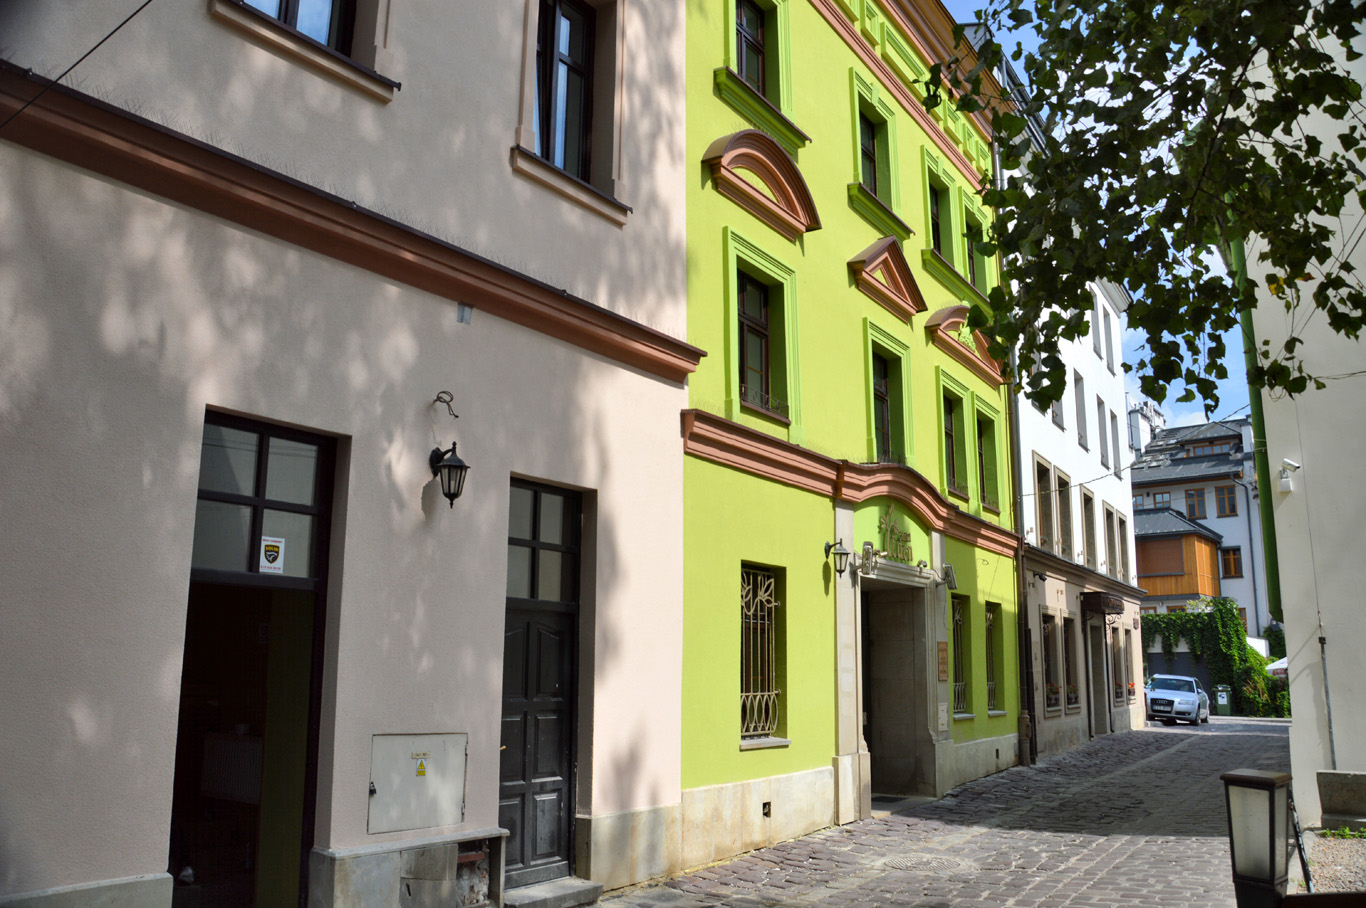 Restored buildings in Kazimierz